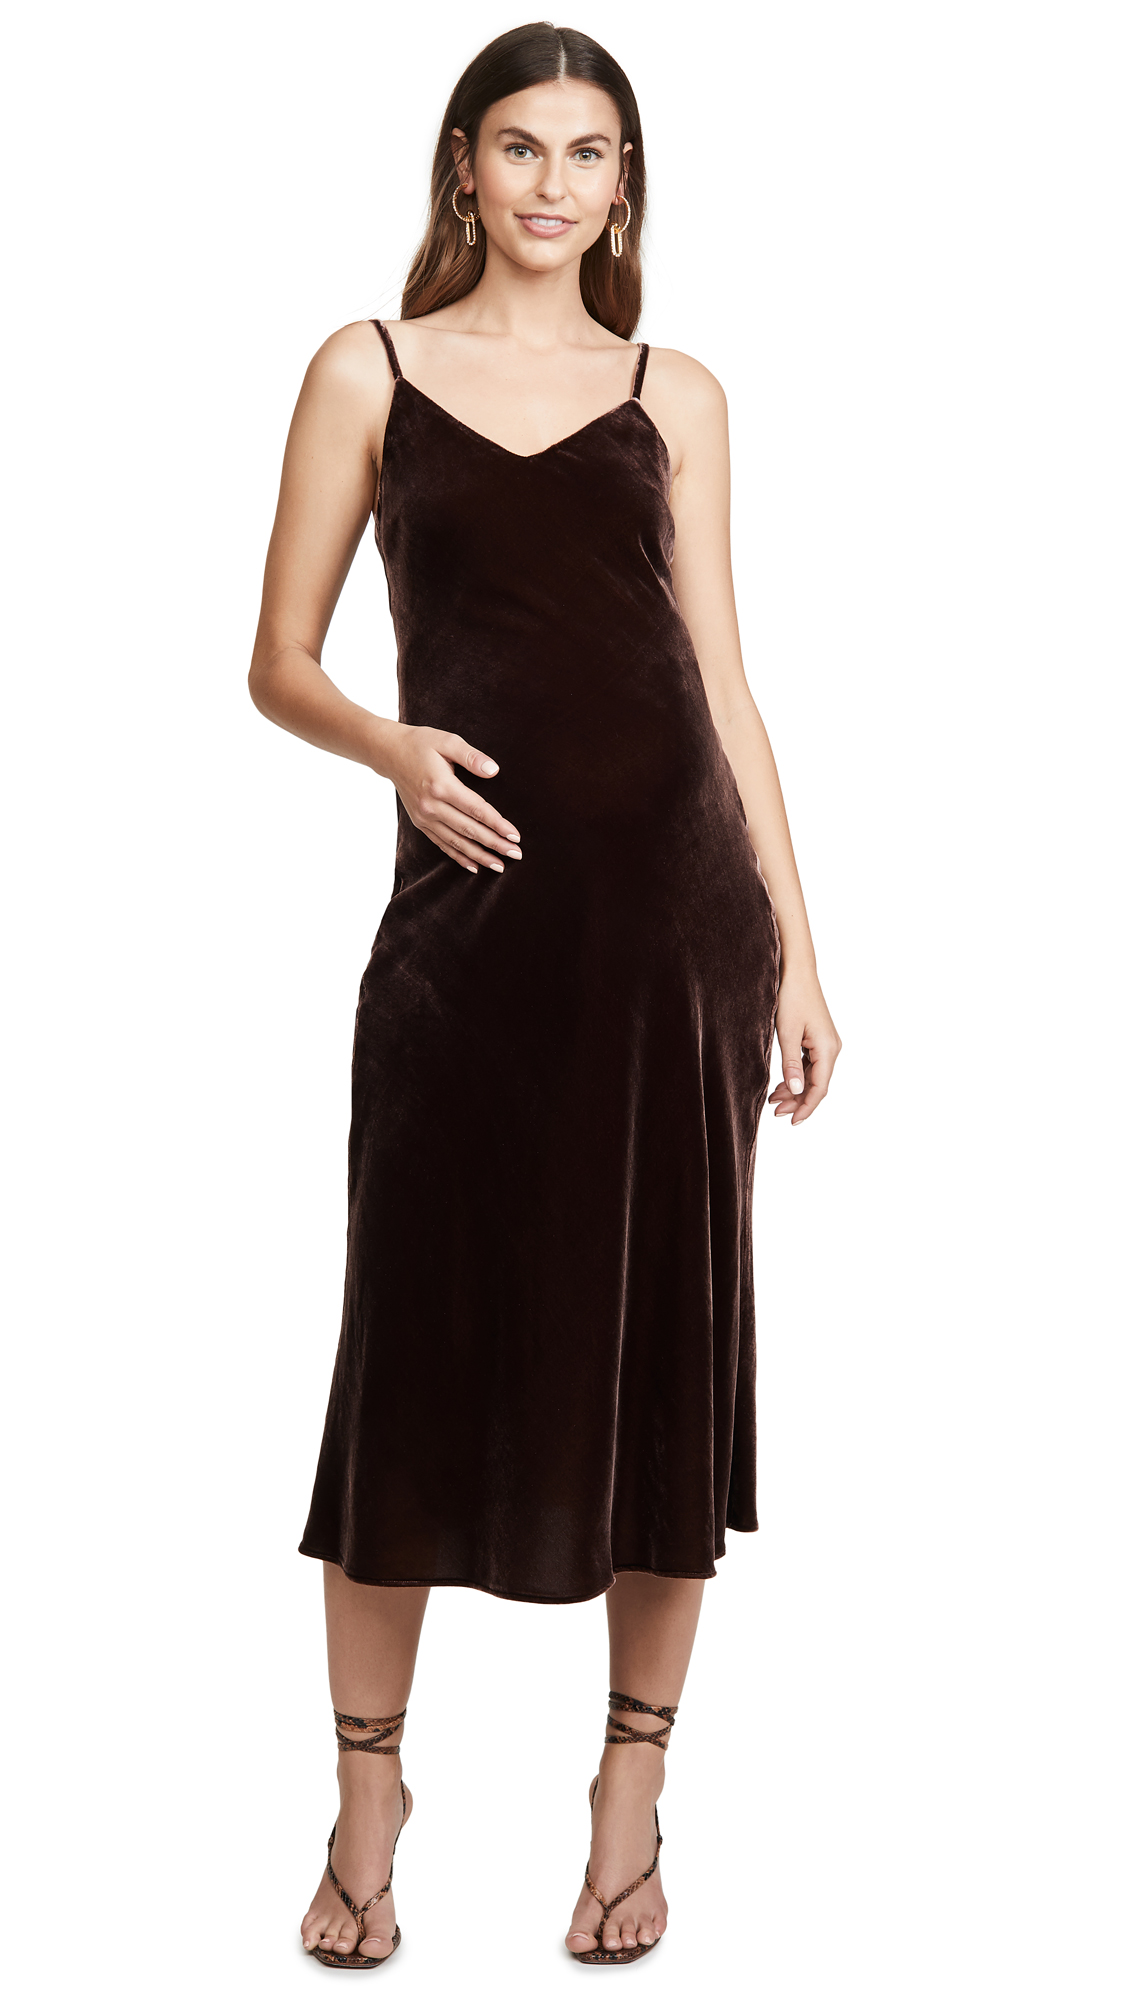 Photo of HATCH The Ricky Slip - shop HATCH Clothing, Dresses online